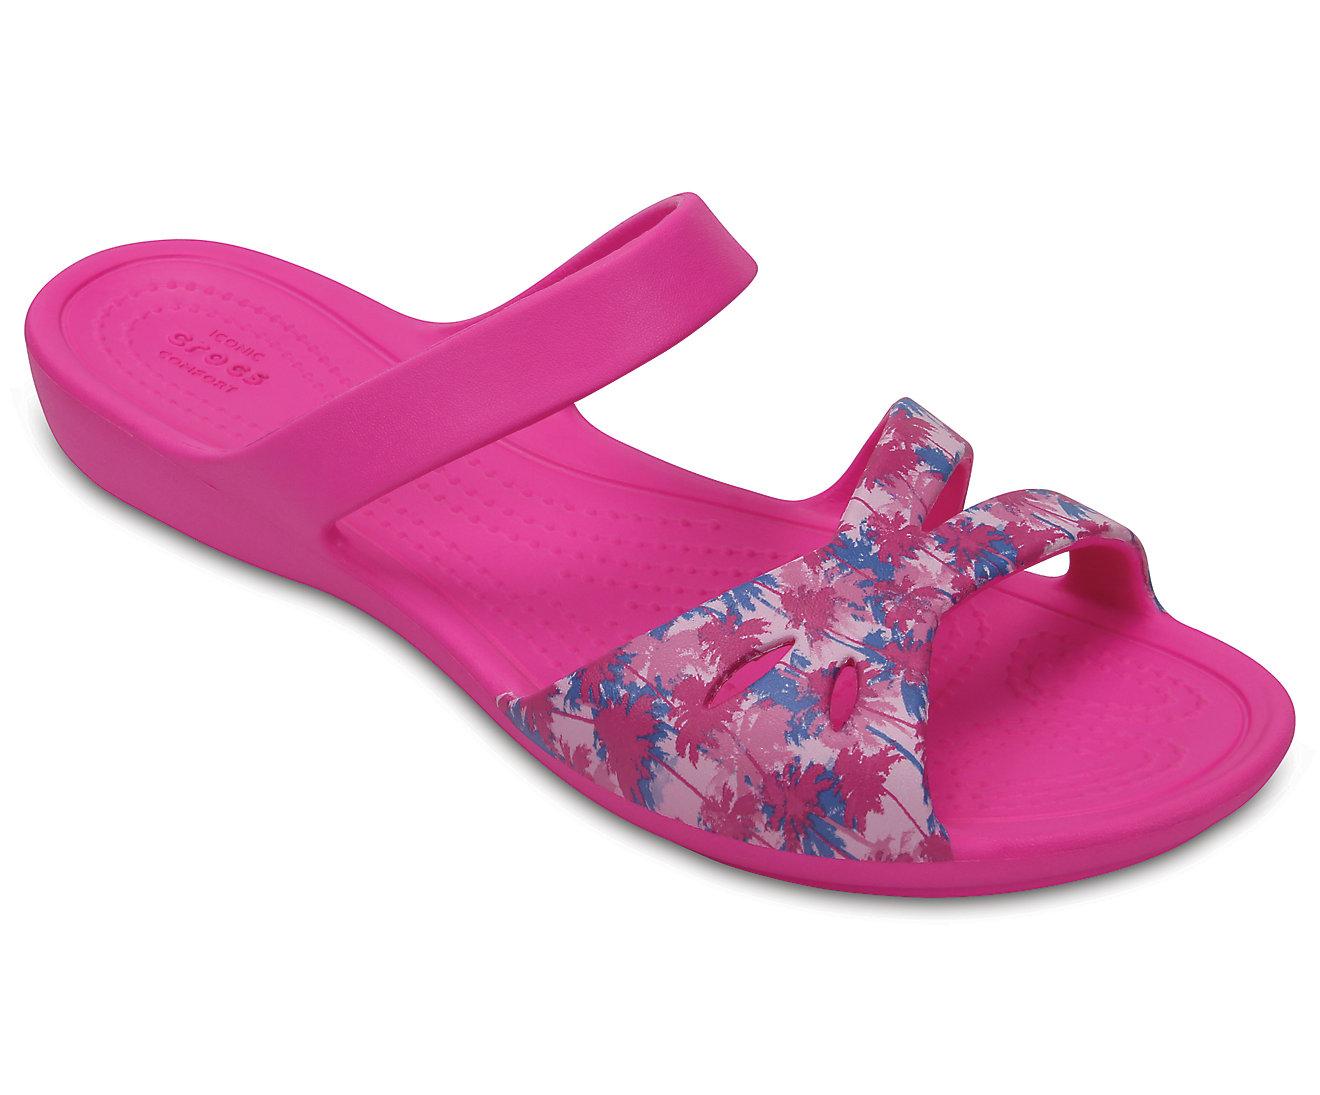 Women's Crocs Kelli Graphic Sandals